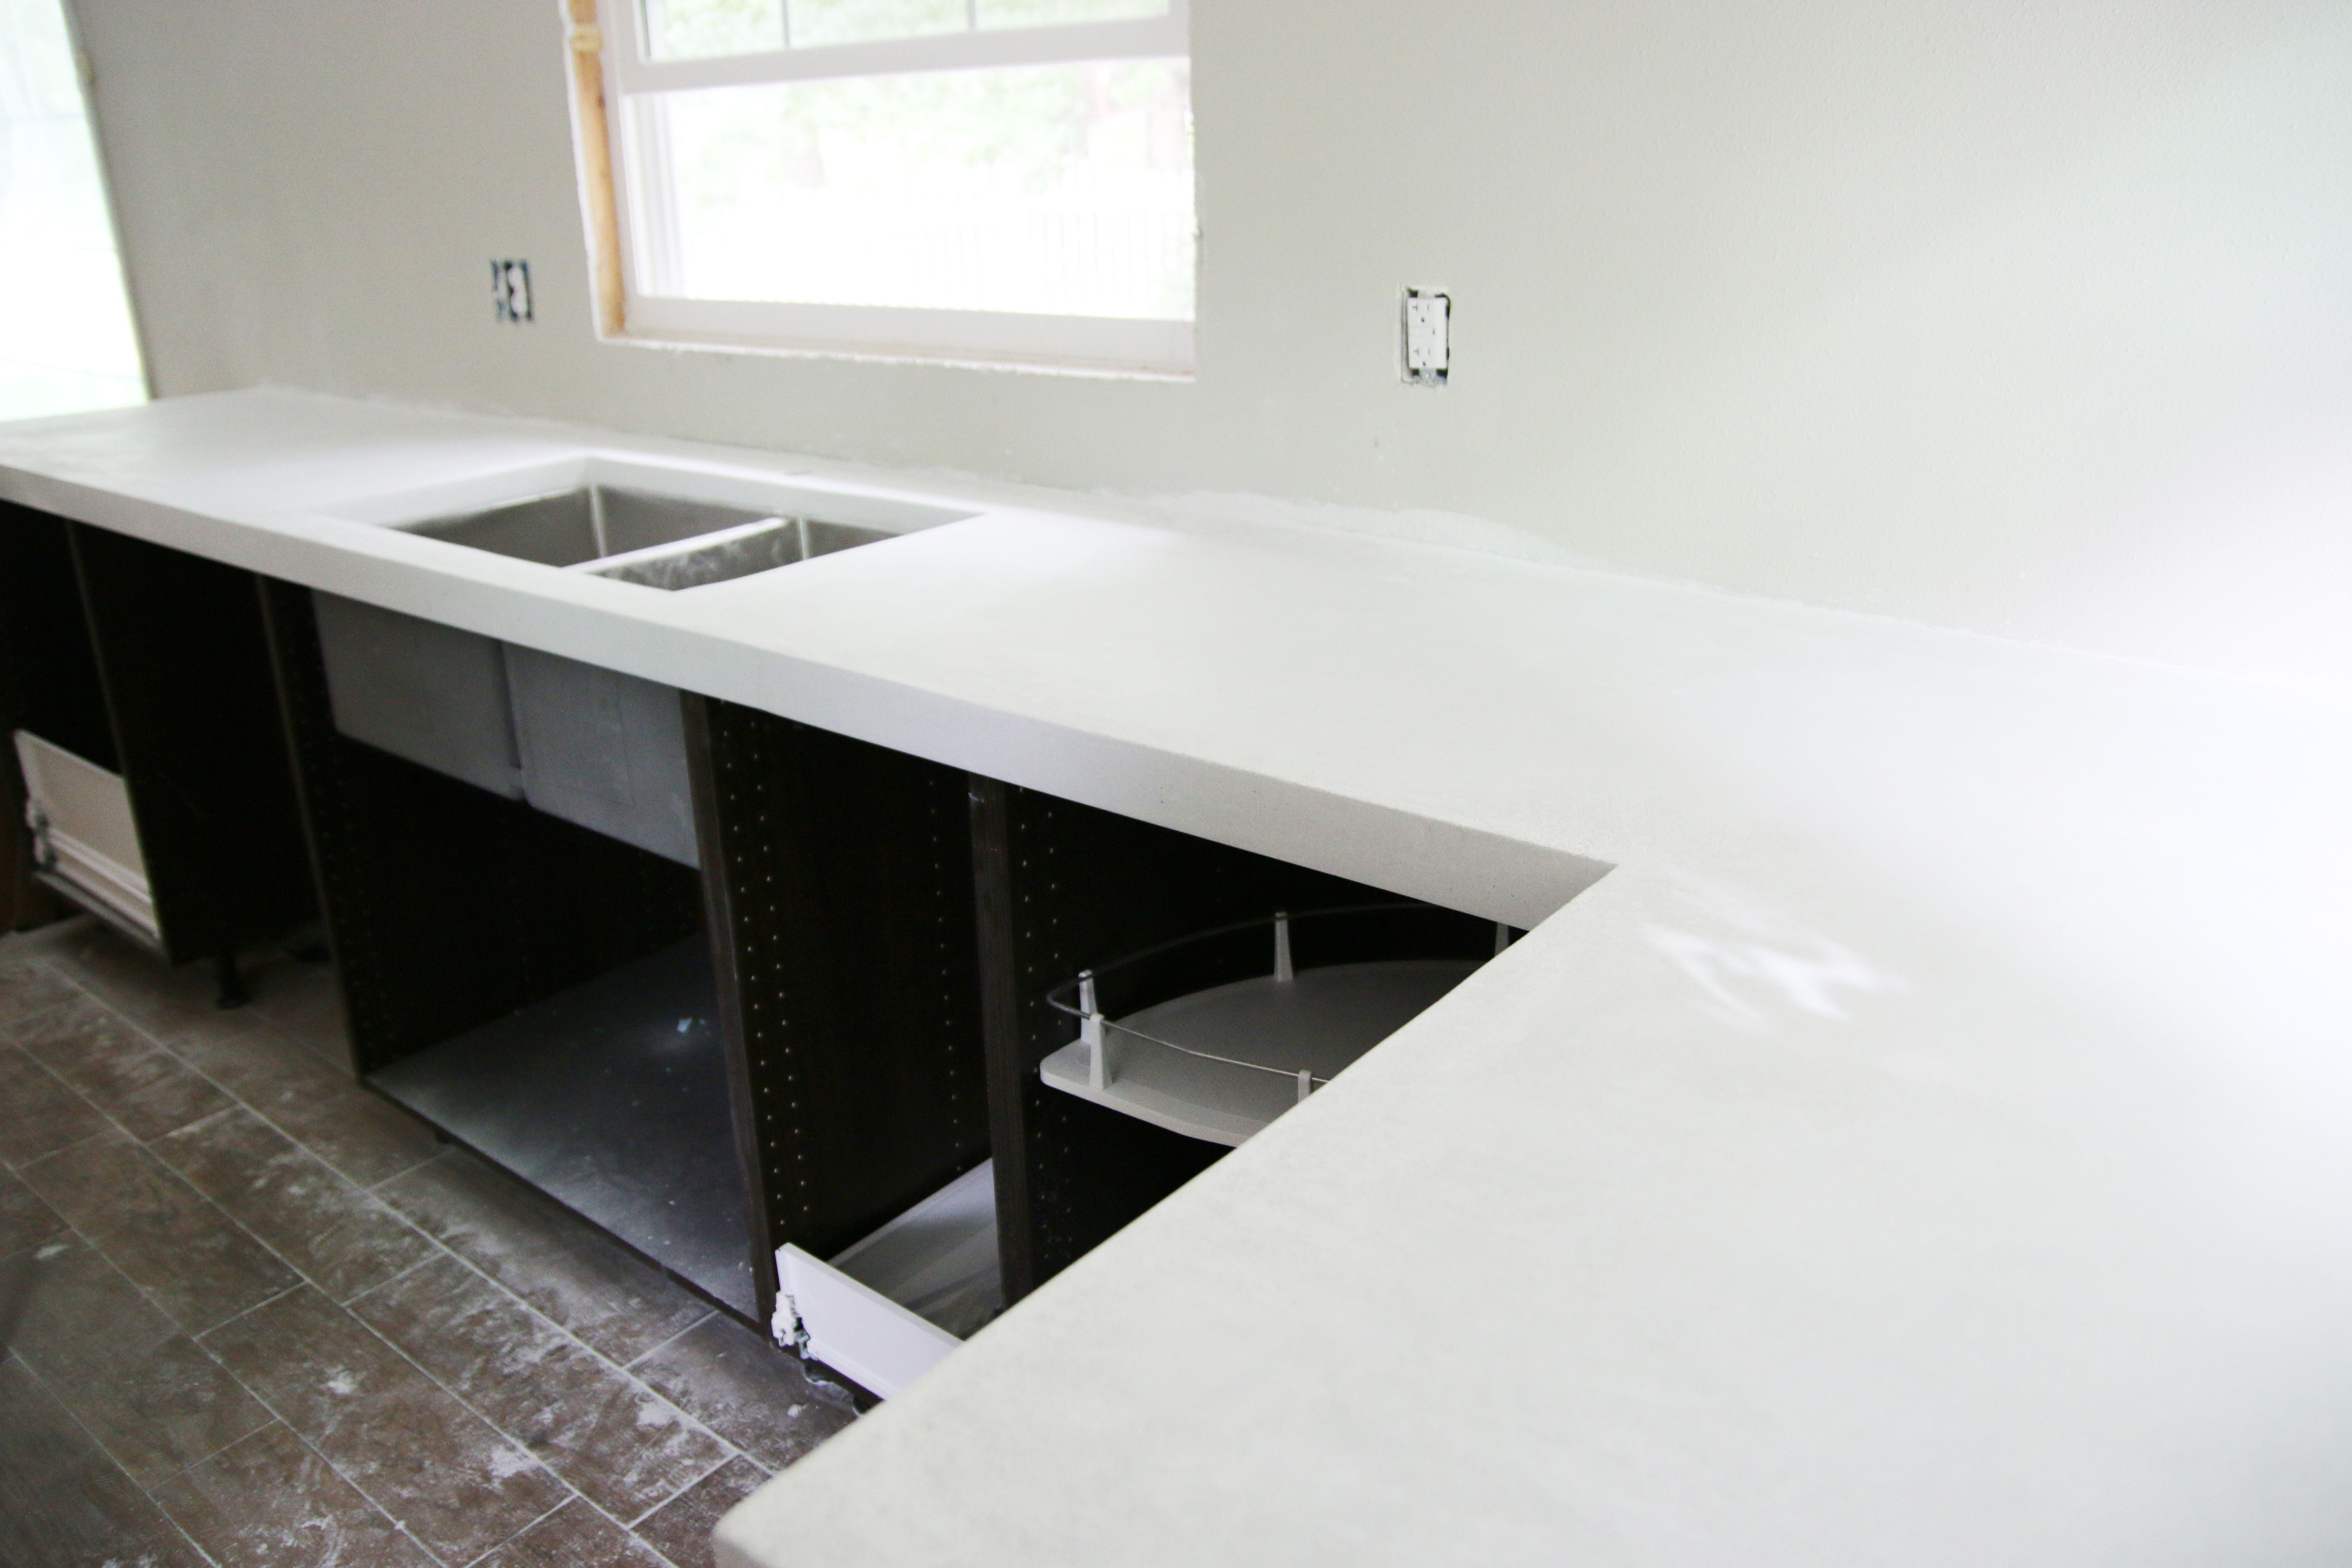 Concrete Countertop Over Laminate Diy White Concrete Countertops White Concrete Countertops